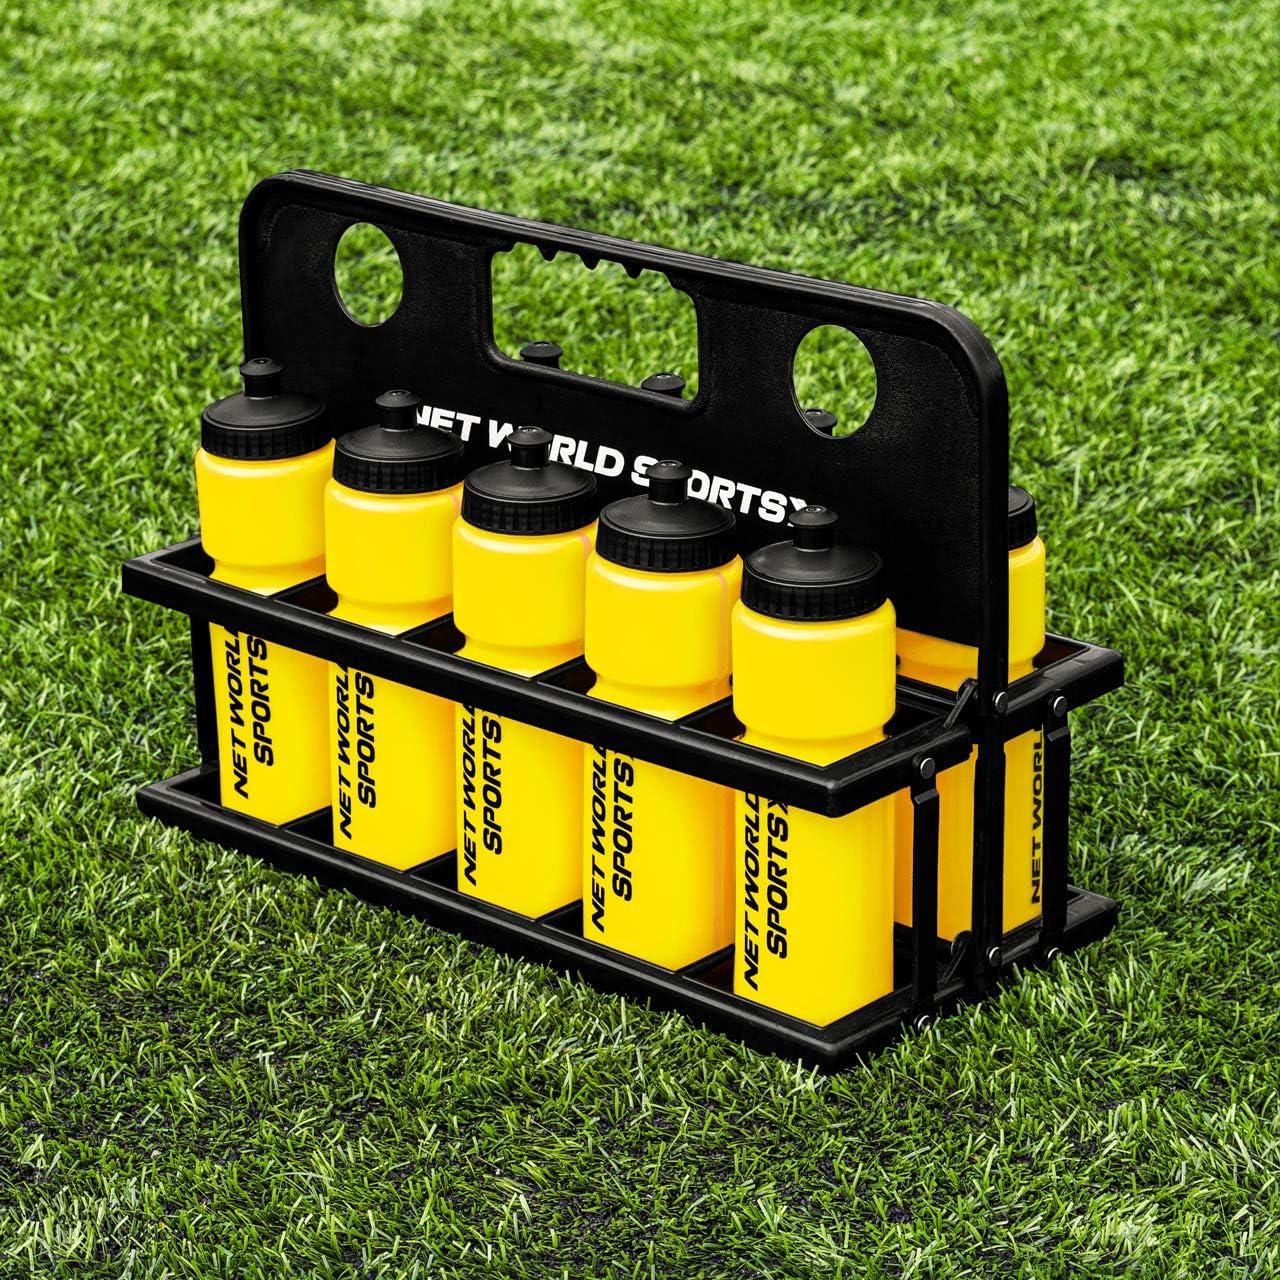 Net World Sports Forza 10 Botellas de Agua 750ml y Porta Botellas